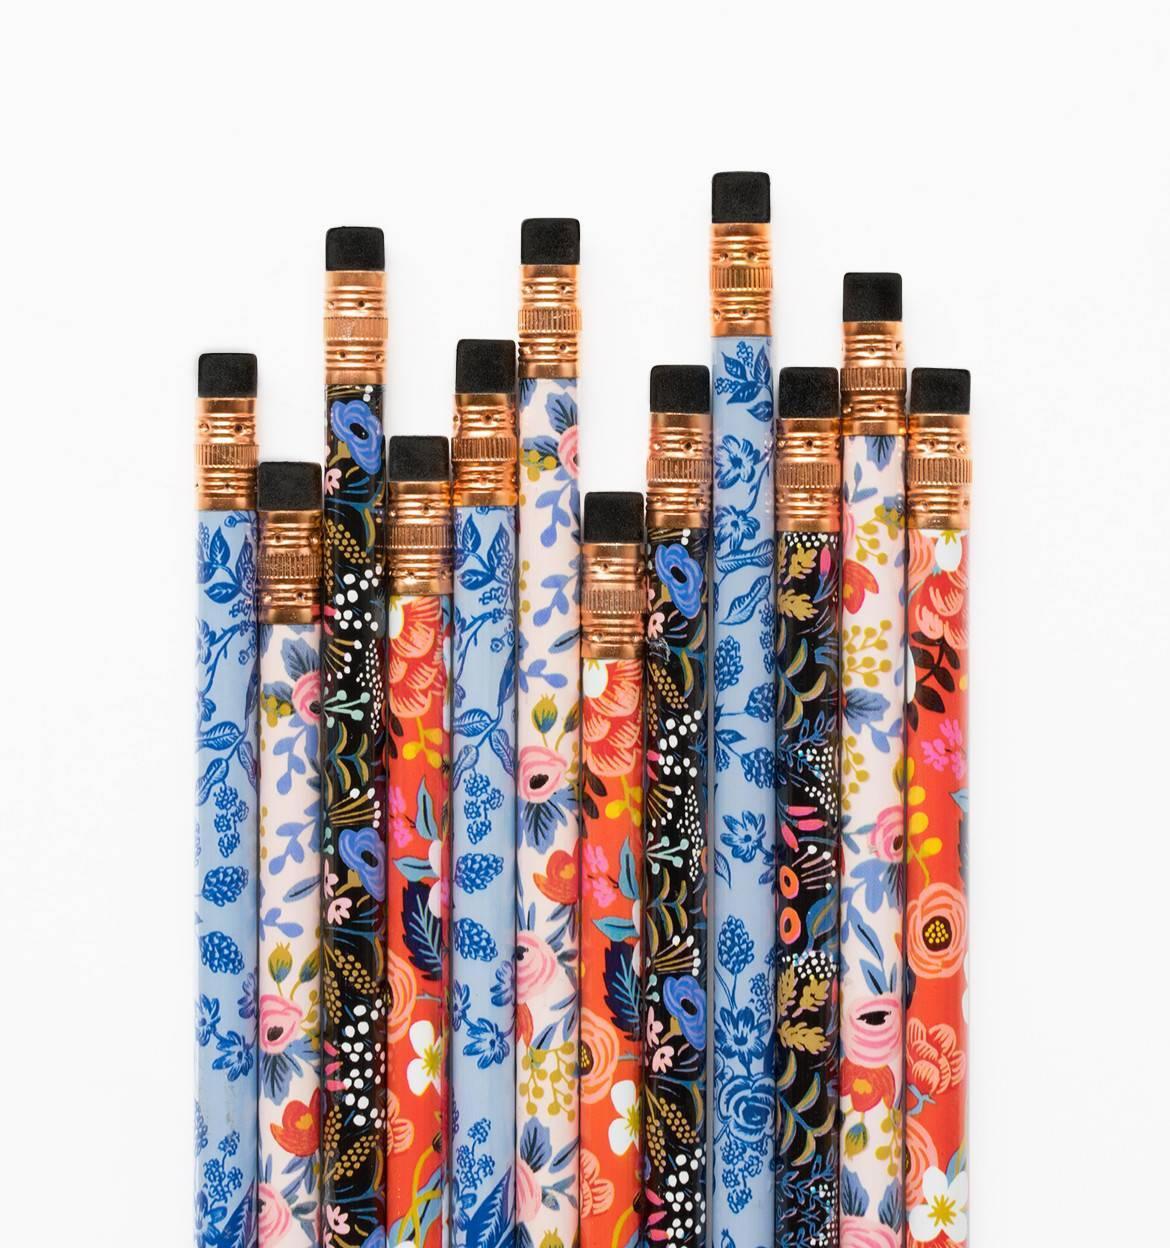 Rifle Paper Co. Tužky Floral - set 12 ks, červená barva, modrá barva, multi barva, dřevo